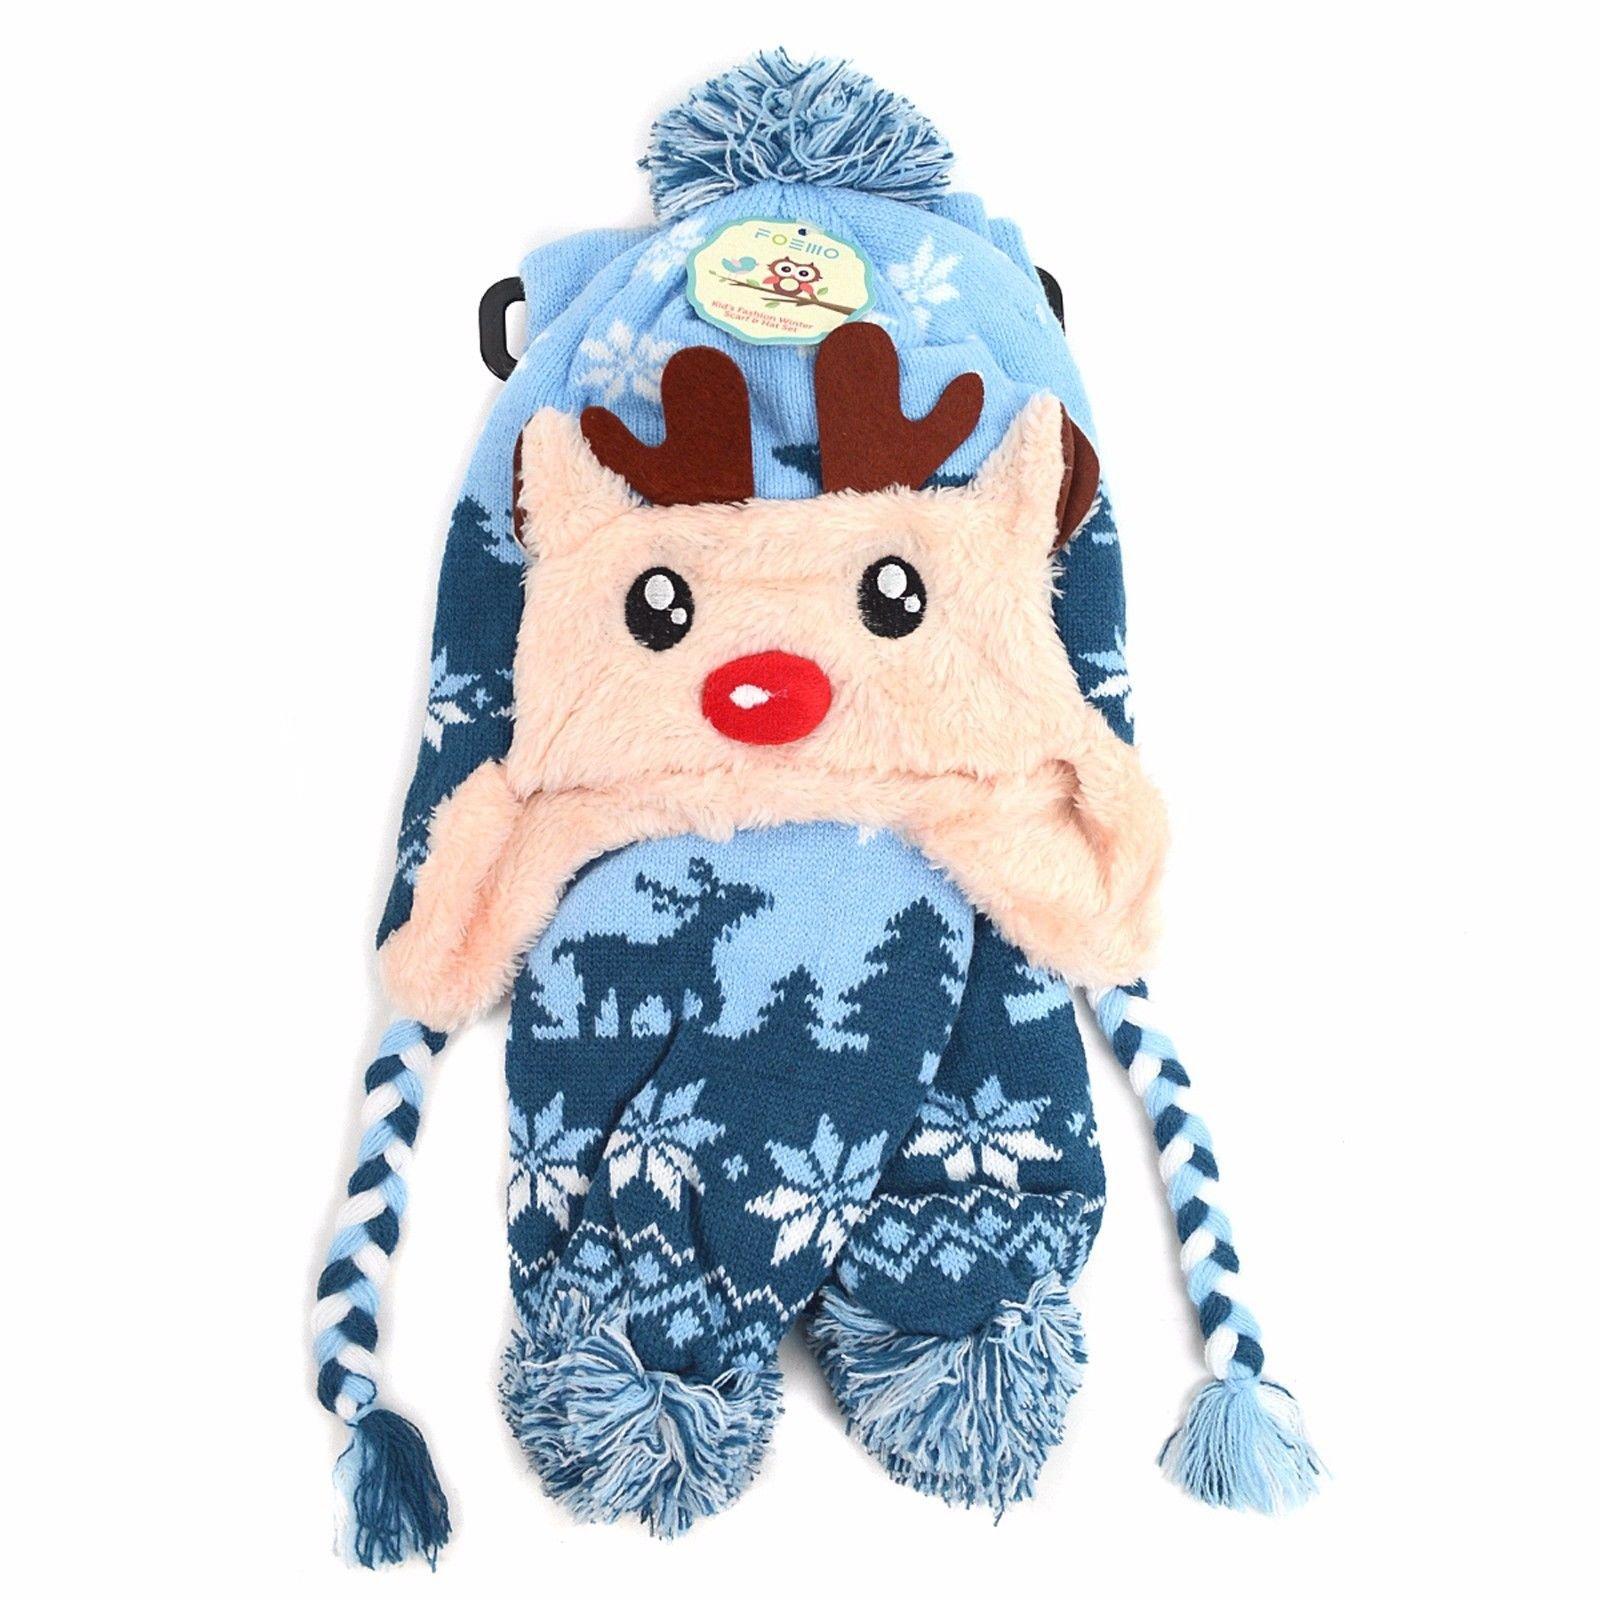 d7b703811 Details about Kid's Scandinavian Reindeer Trapper Hat and Scarf Winter Set  (KKWS1732)